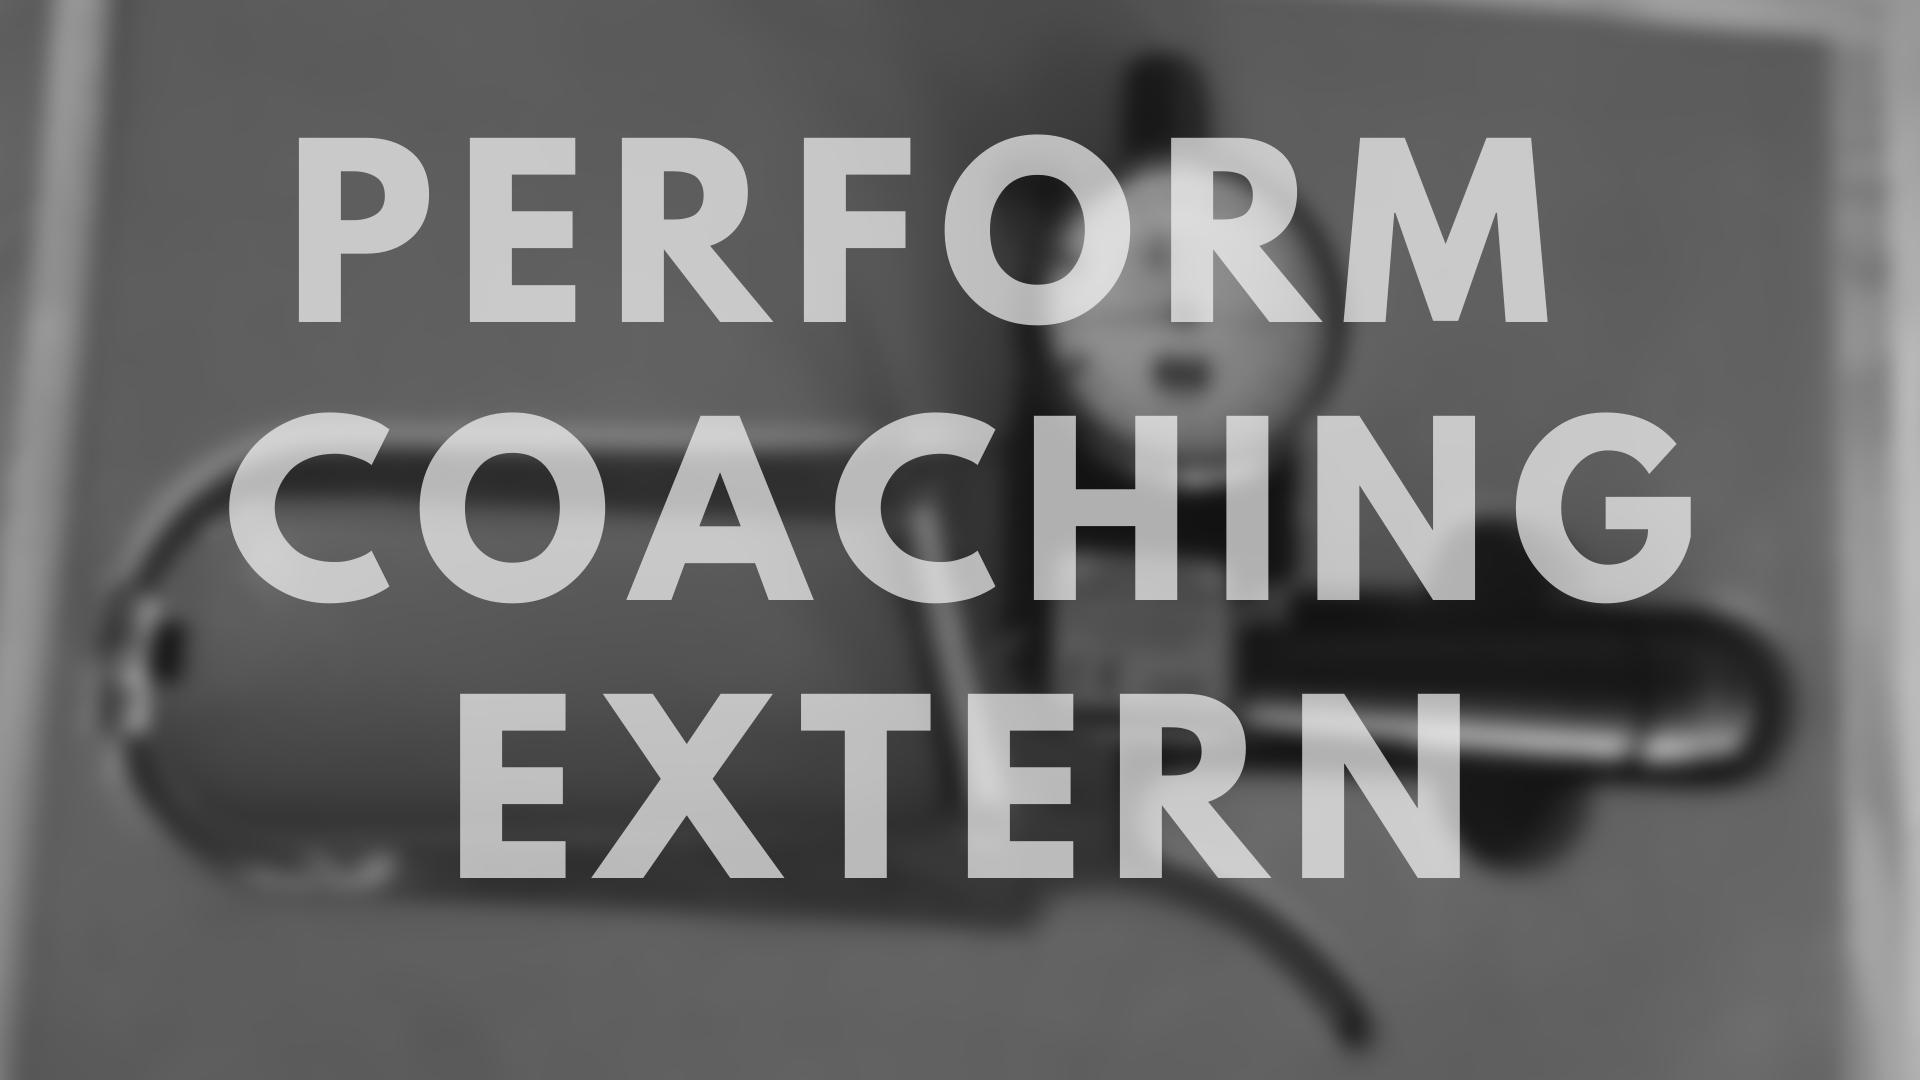 Perform Coaching extern